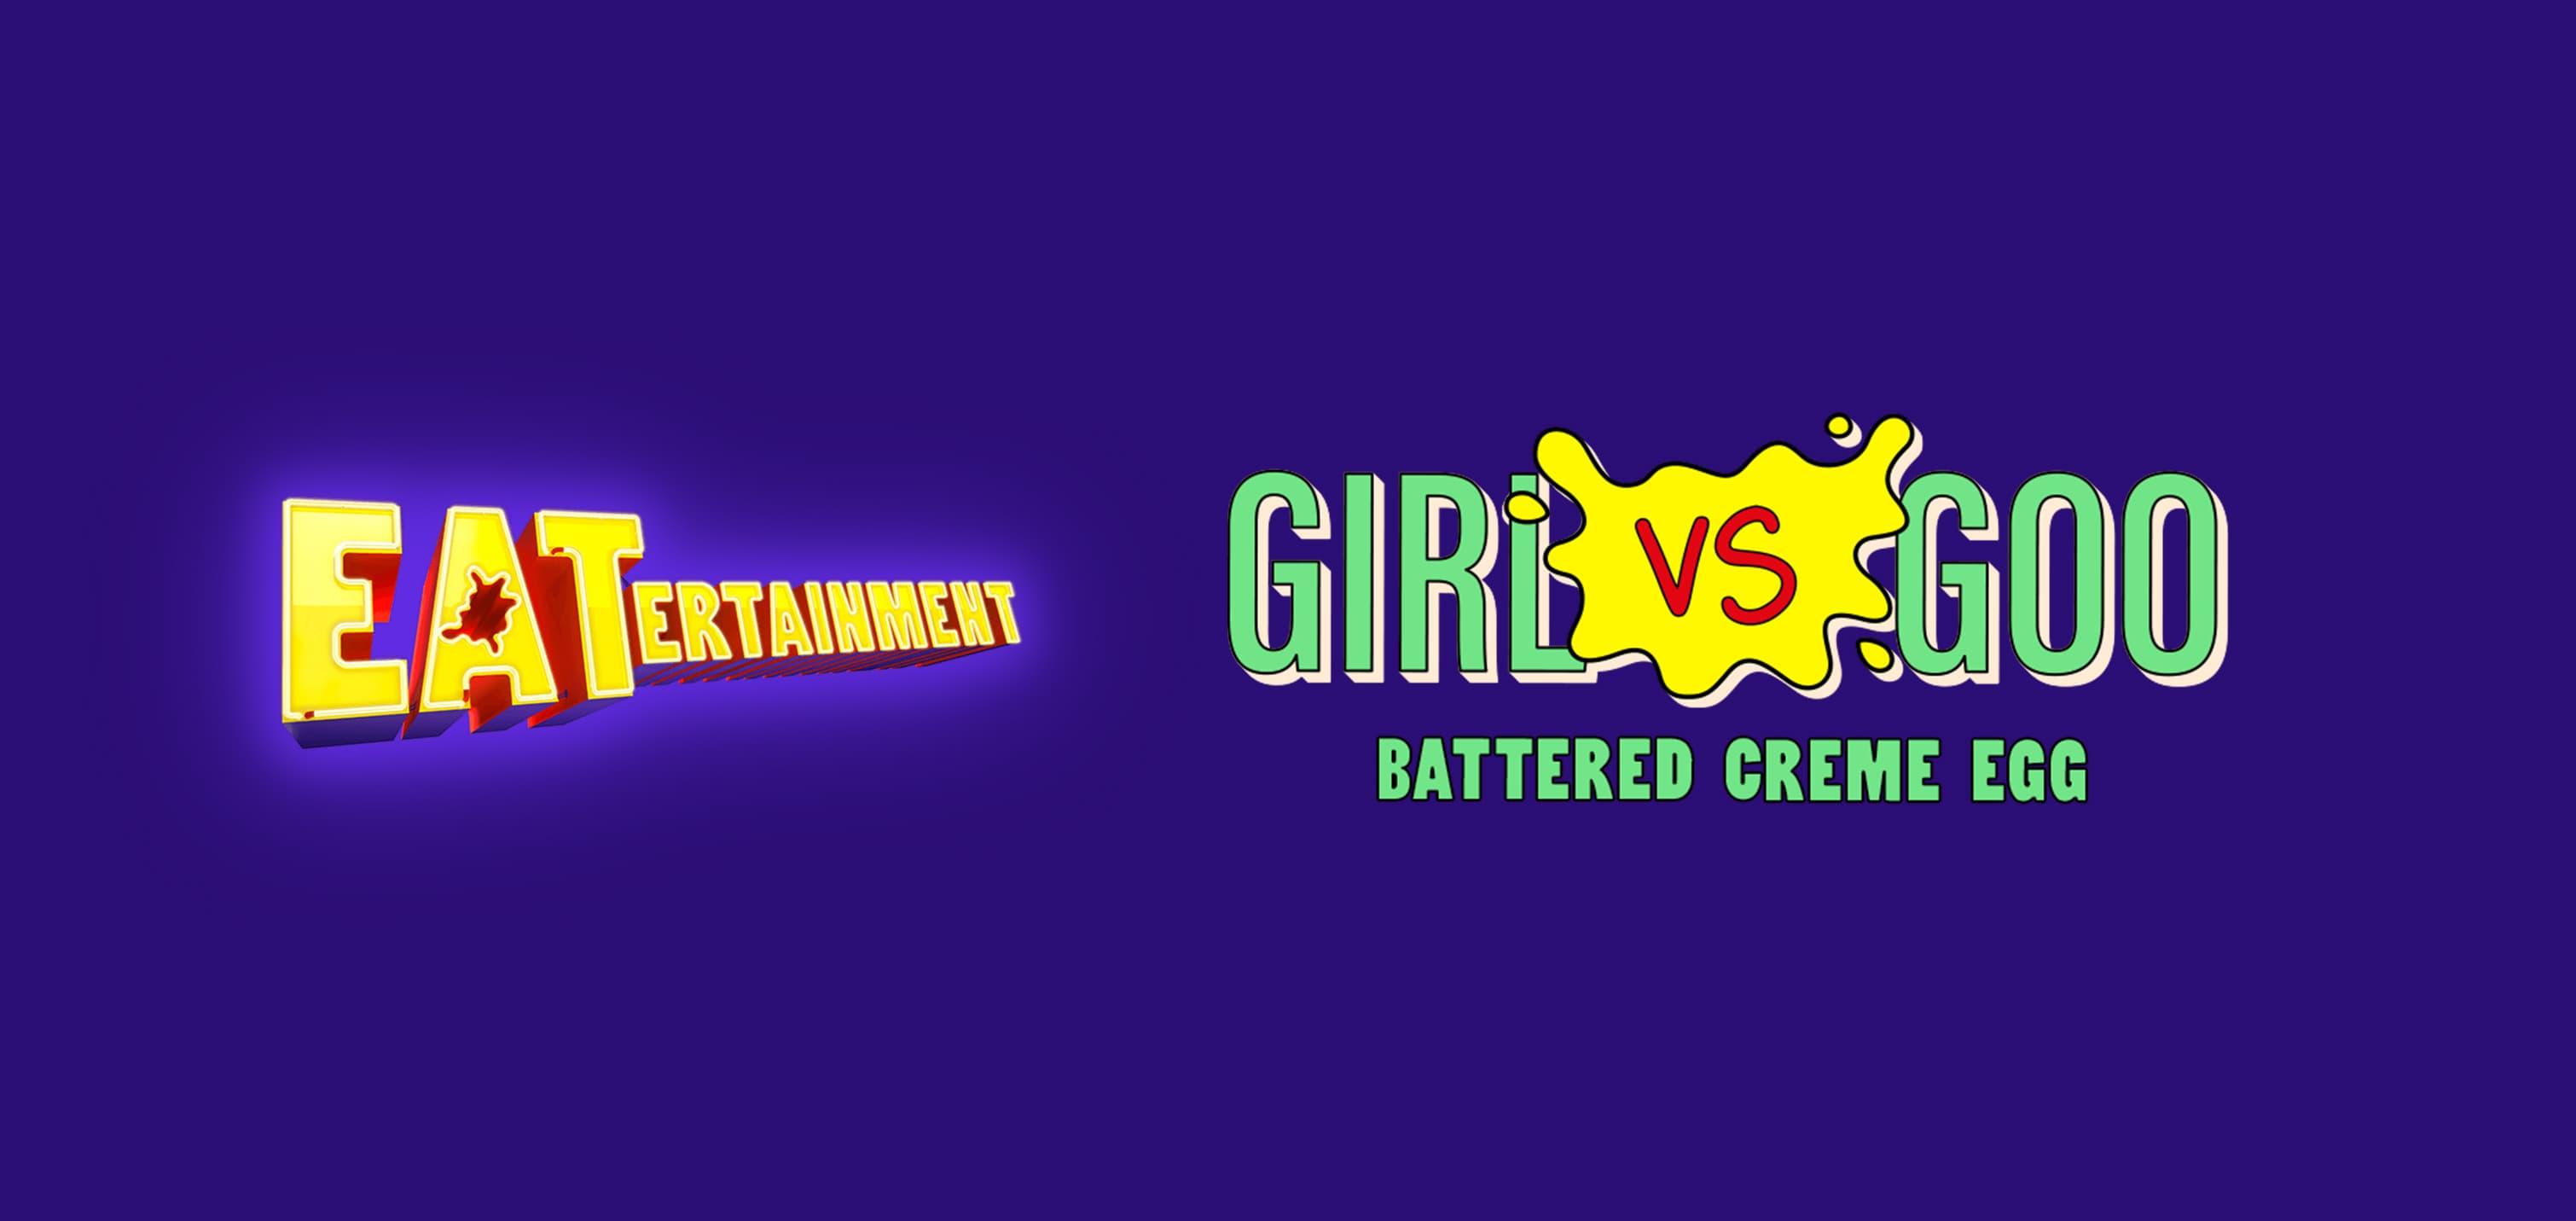 Simpsons and Cadbury's Eatertainment